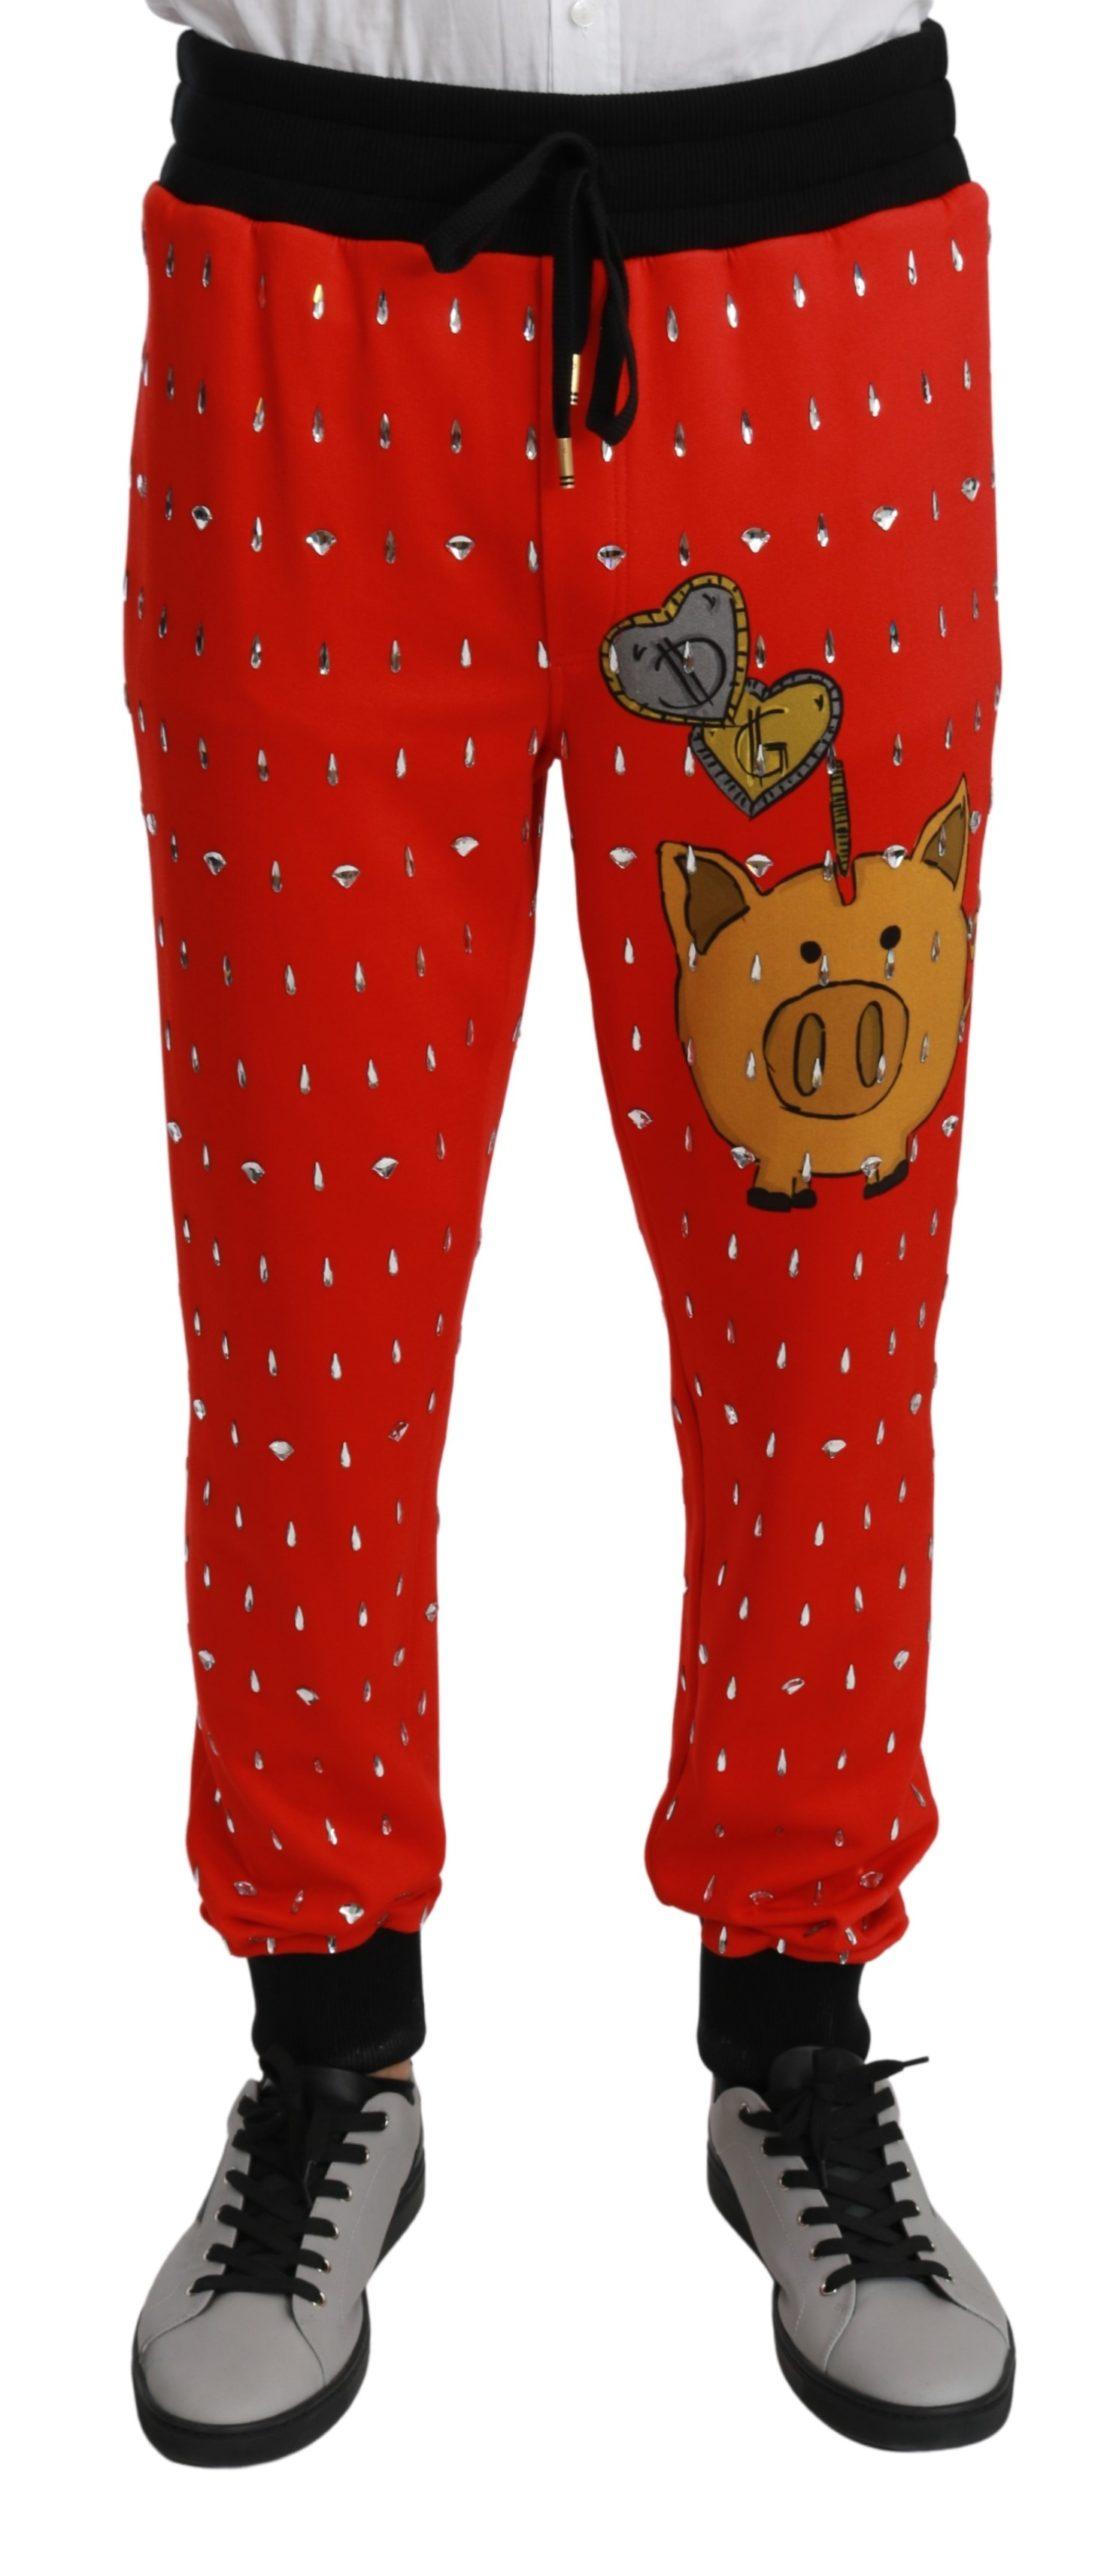 Dolce & Gabbana Men's Piggy Bank Cotton Crystal Trouser Red PAN70957 - IT44 | XS